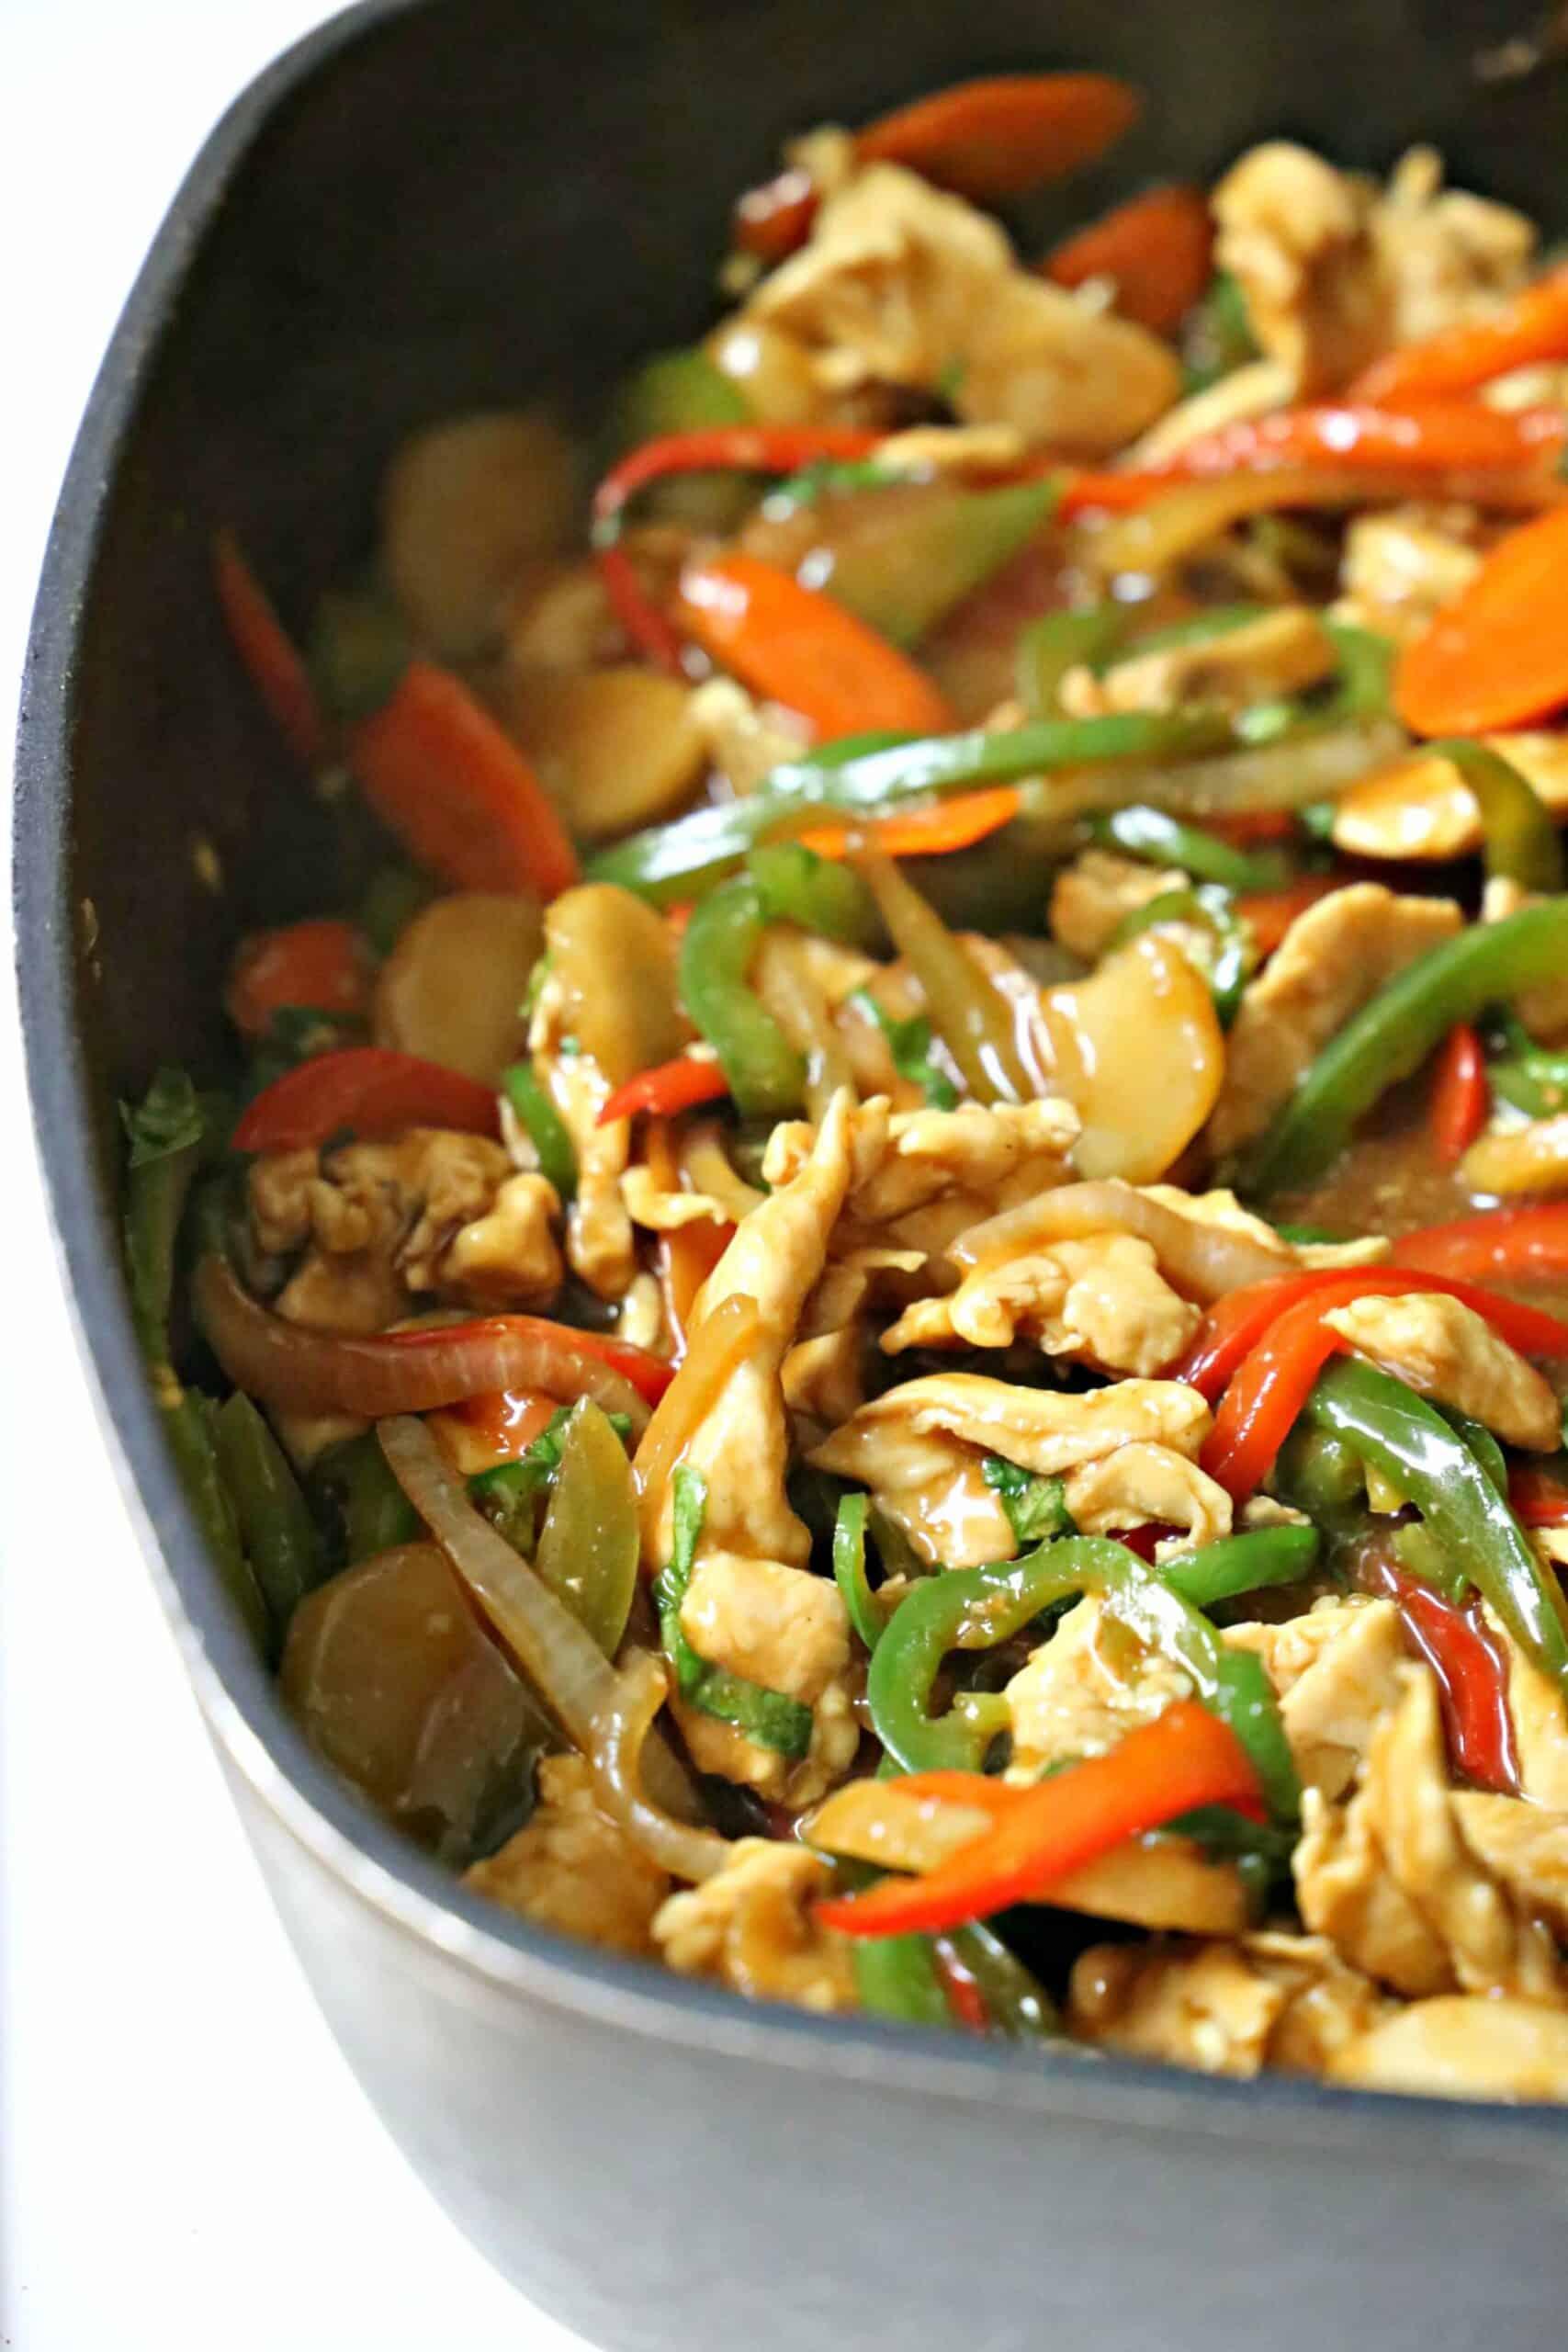 basil chicken stir-fry in a pan